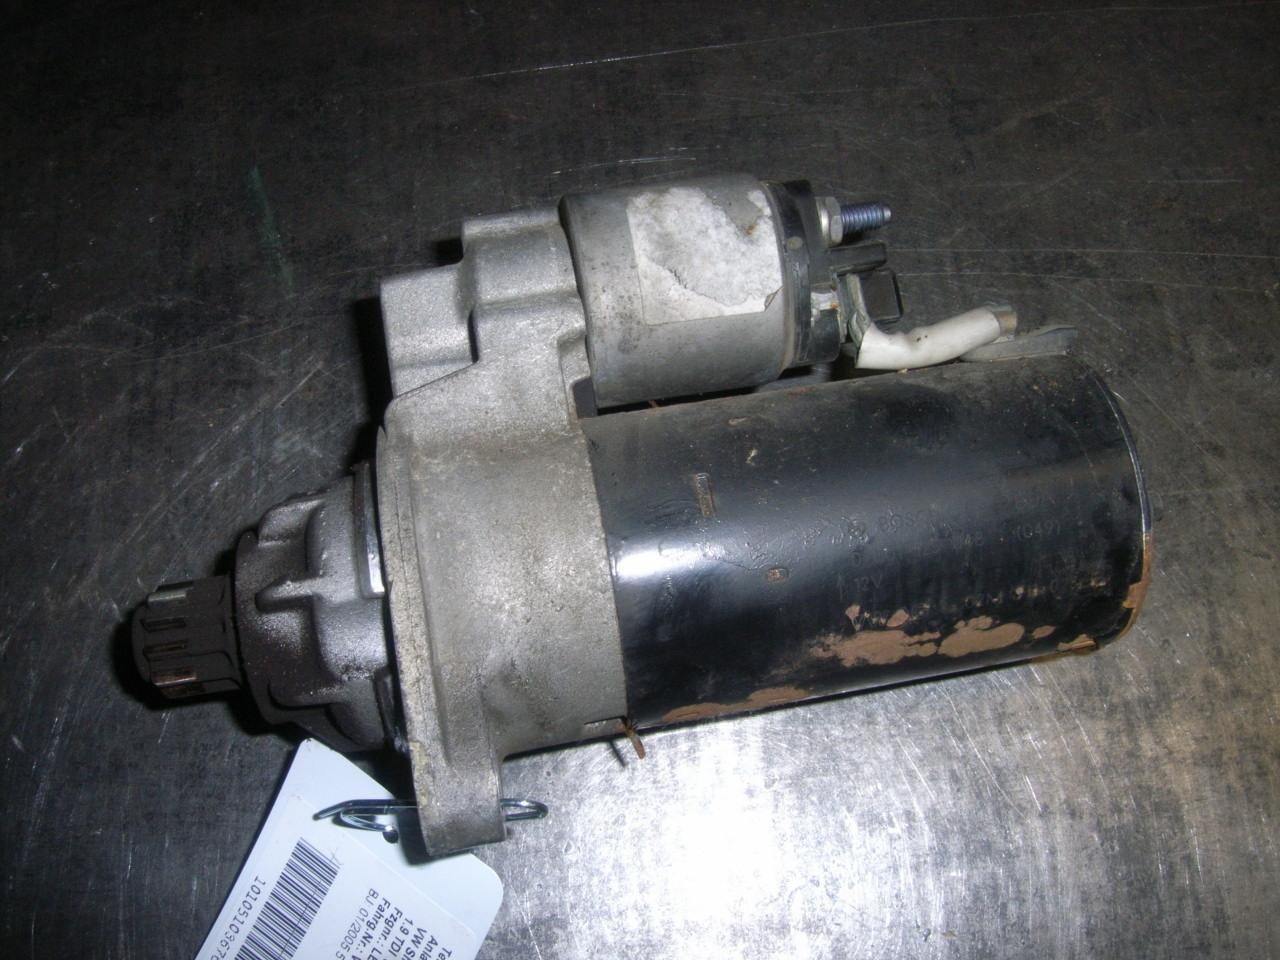 Zündspule 12V vorne Tourmax Anker Zündanker ignition coil rear spark coil VS VL